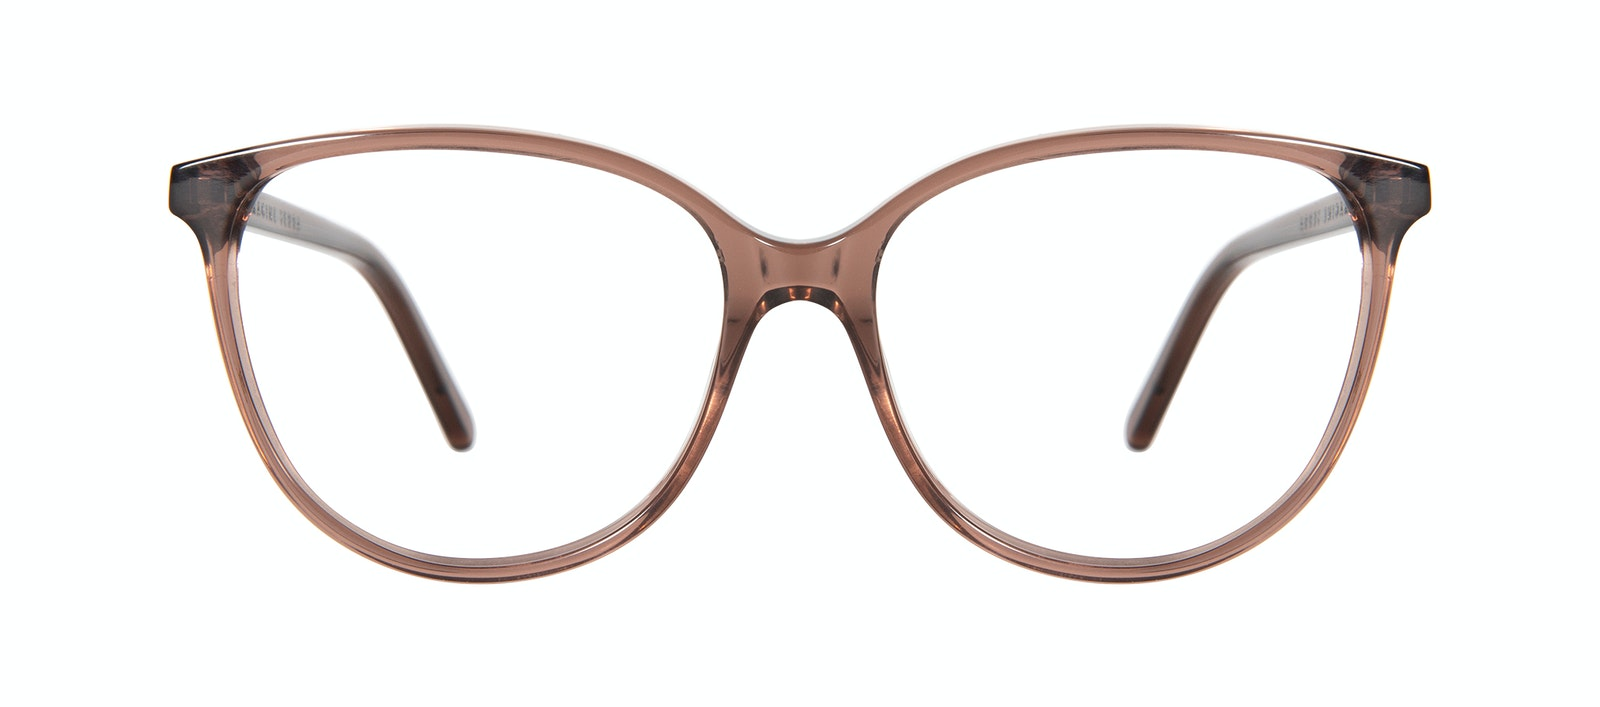 Affordable Fashion Glasses Cat Eye Eyeglasses Women Imagine Terra Front